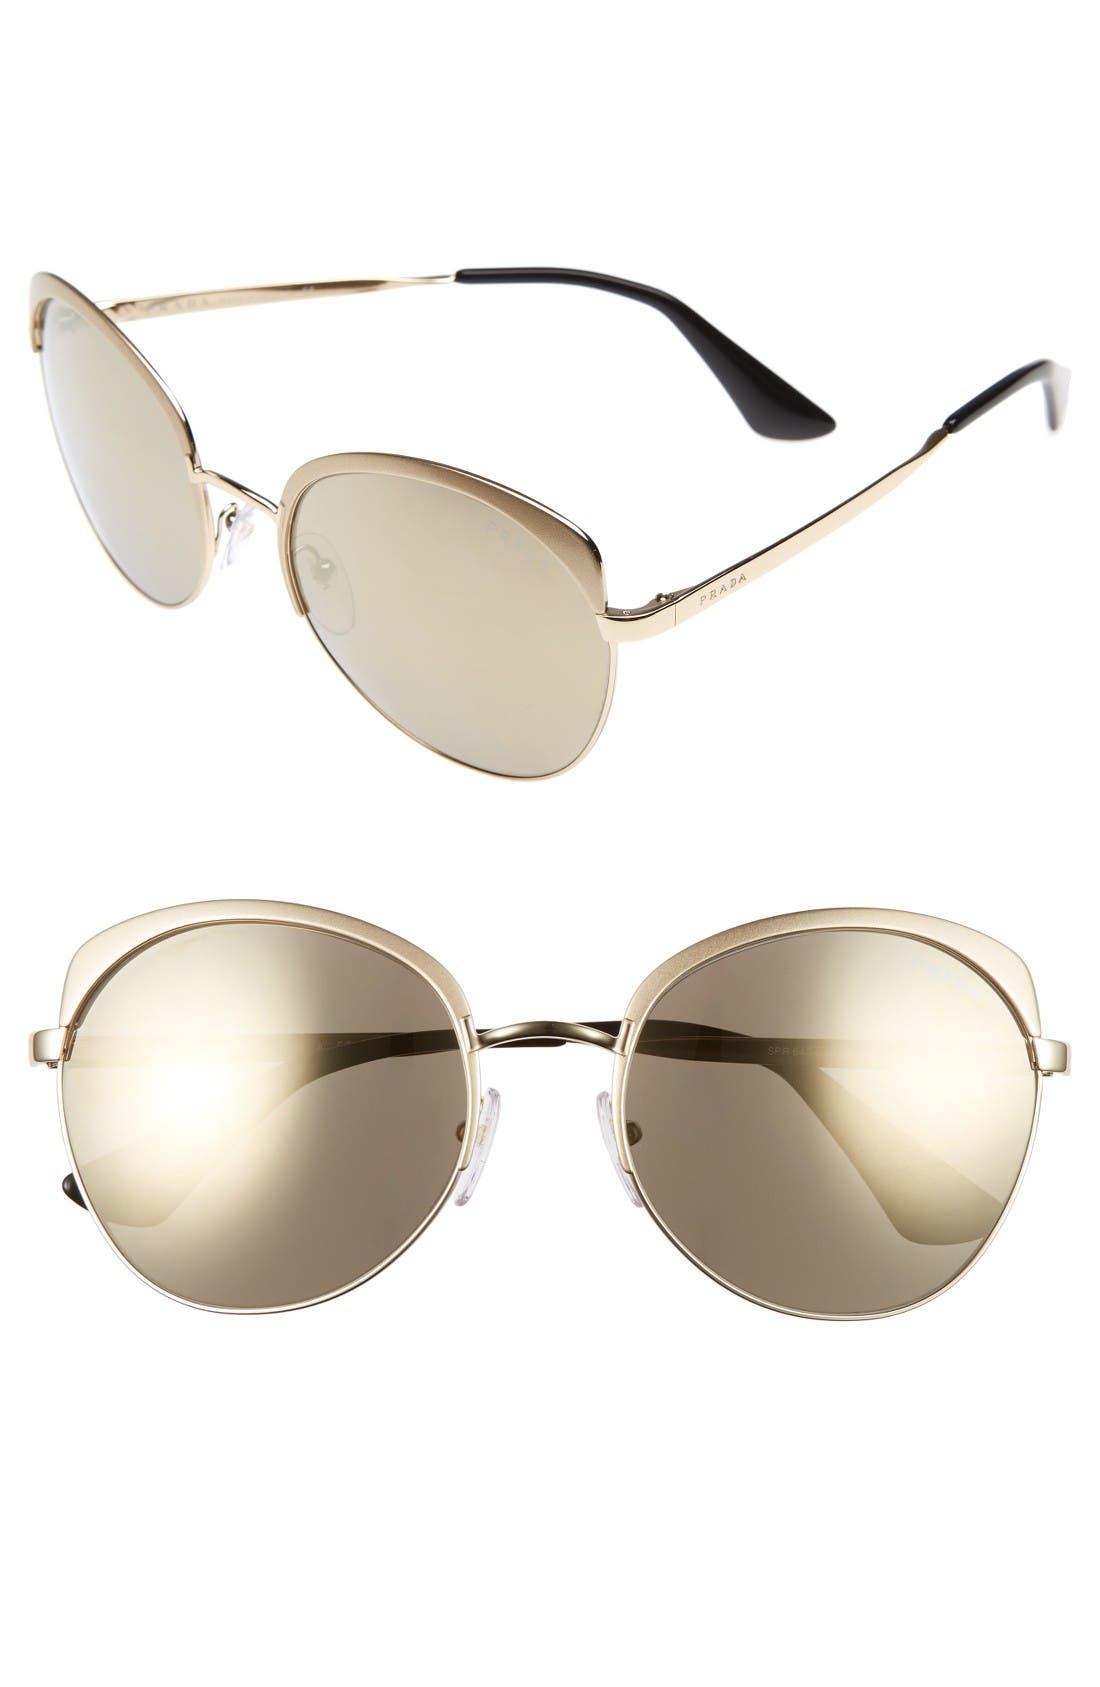 59mm Sunglasses,                         Main,                         color, Pale Gold